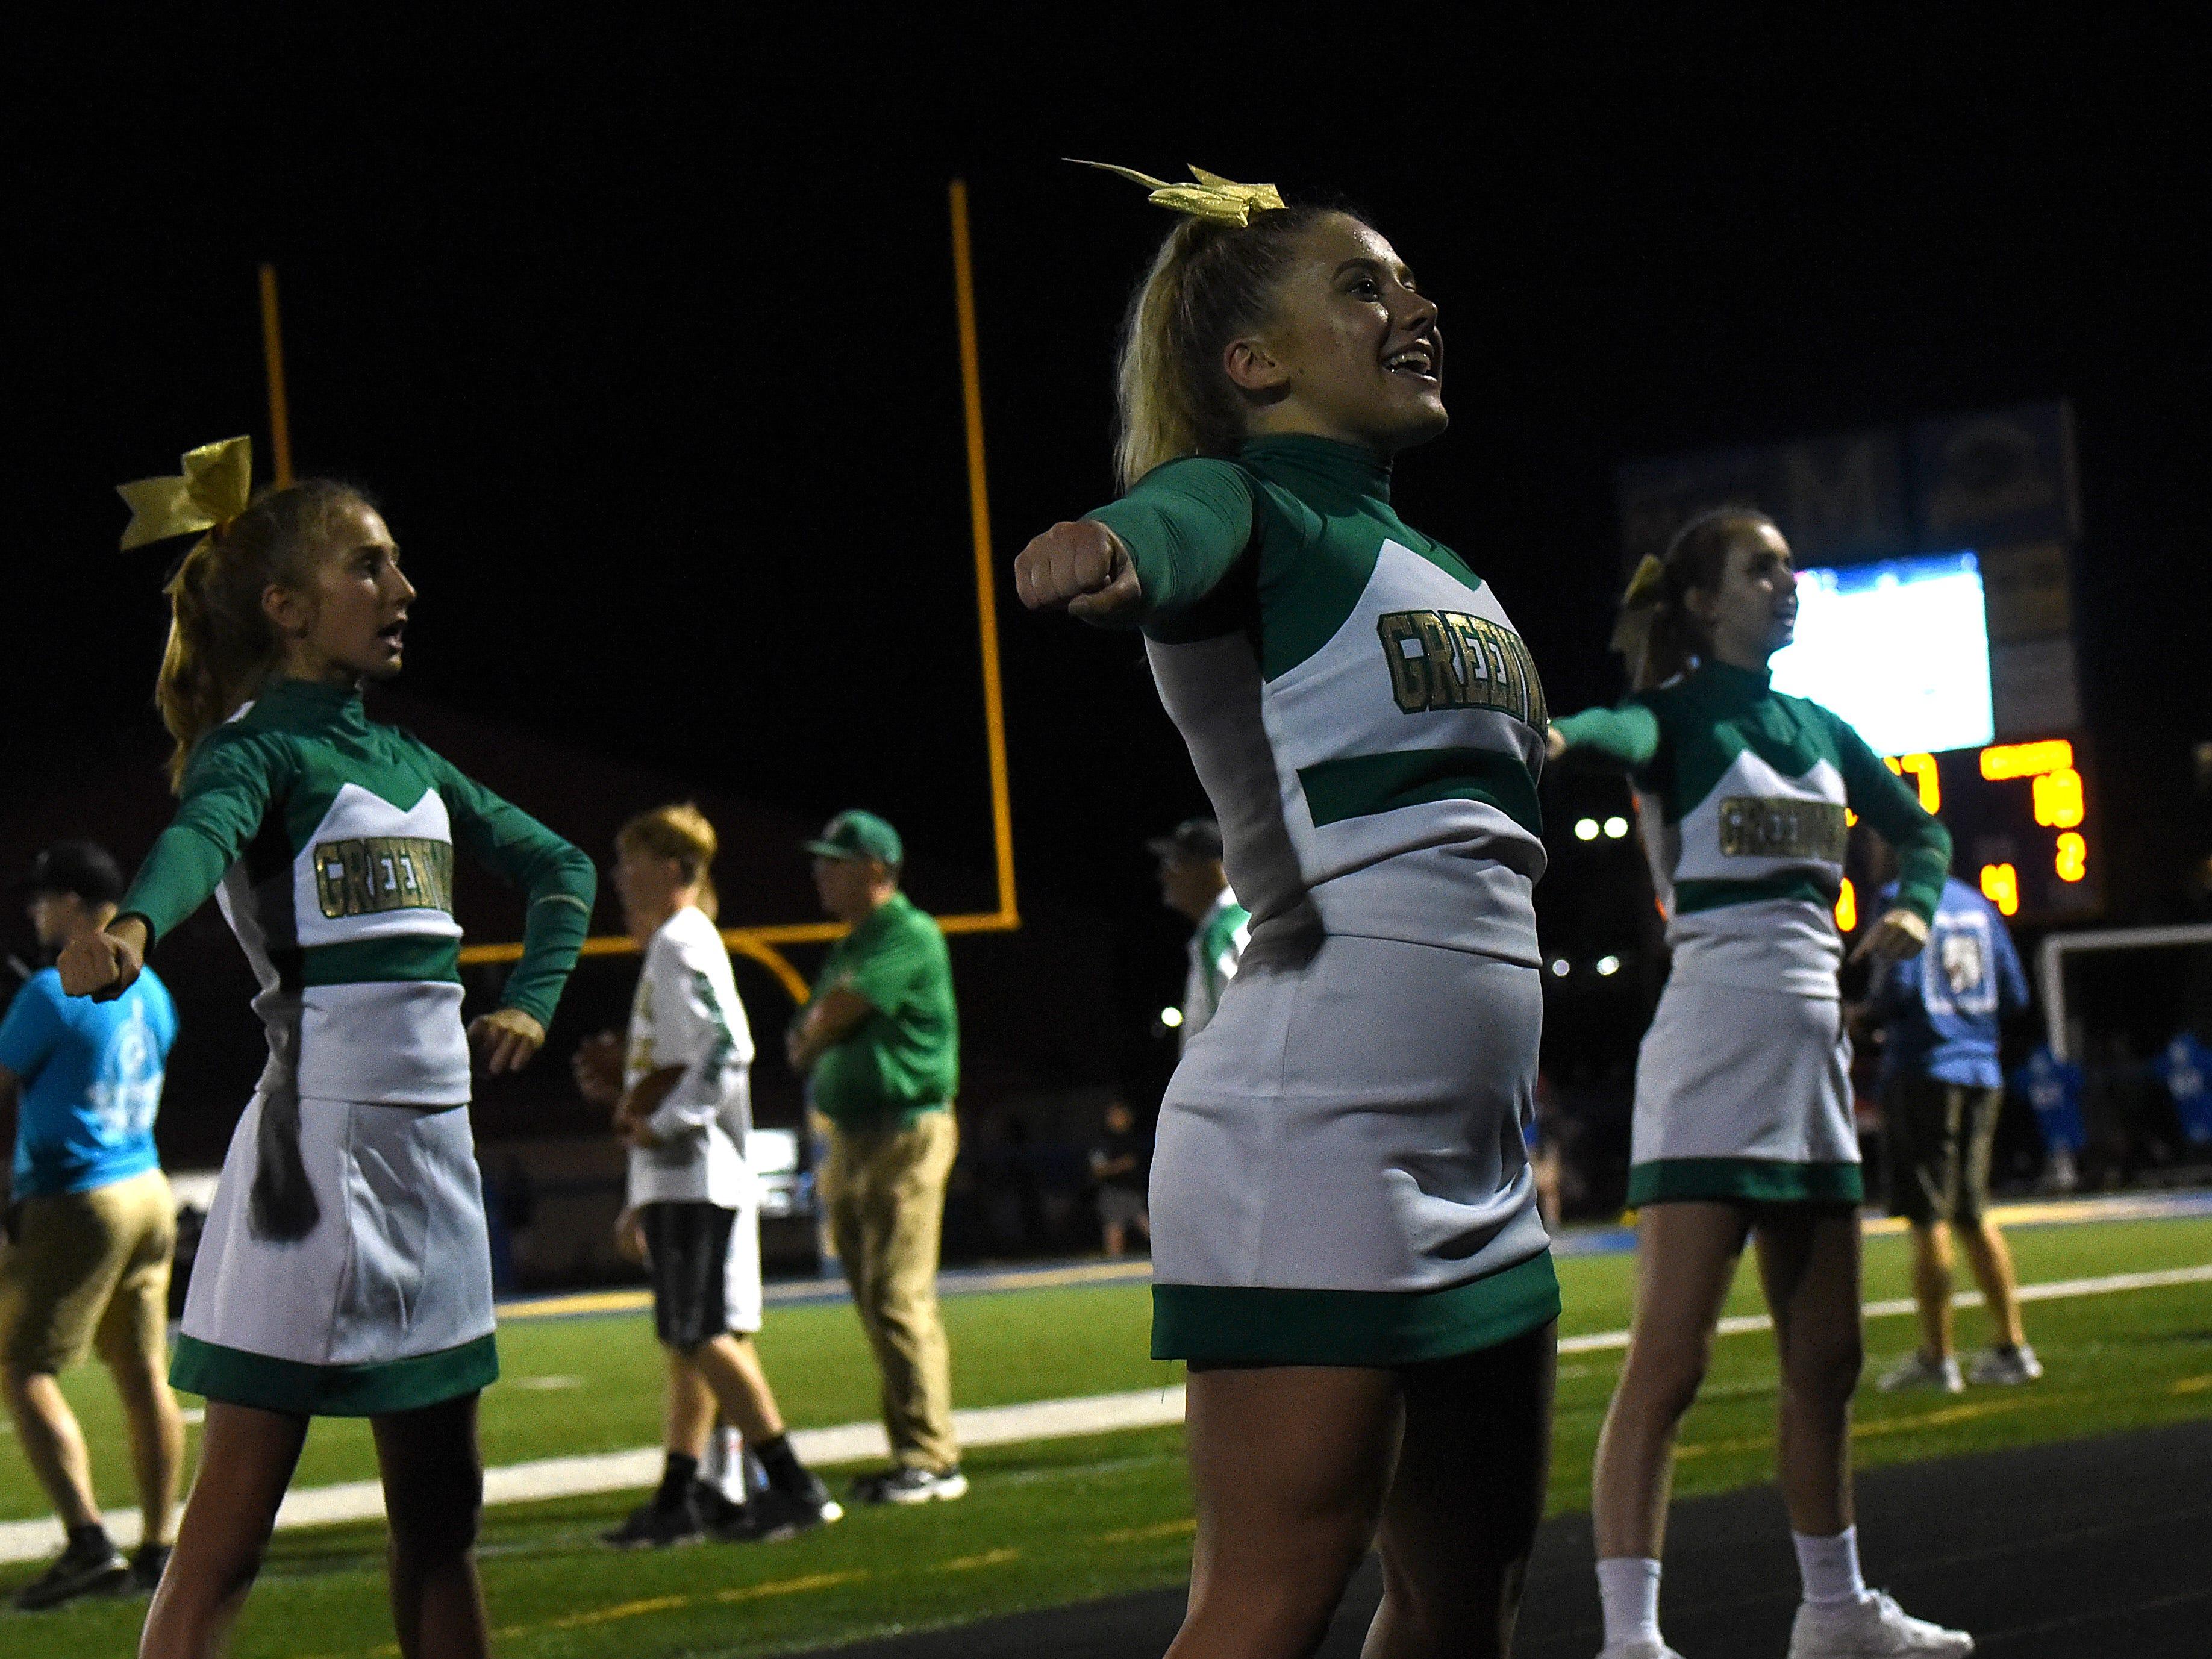 Newark Catholic senior Maddi Muetzel cheers for the Green Wave on Thursday, Aug. 23, 2018 at Maysville.